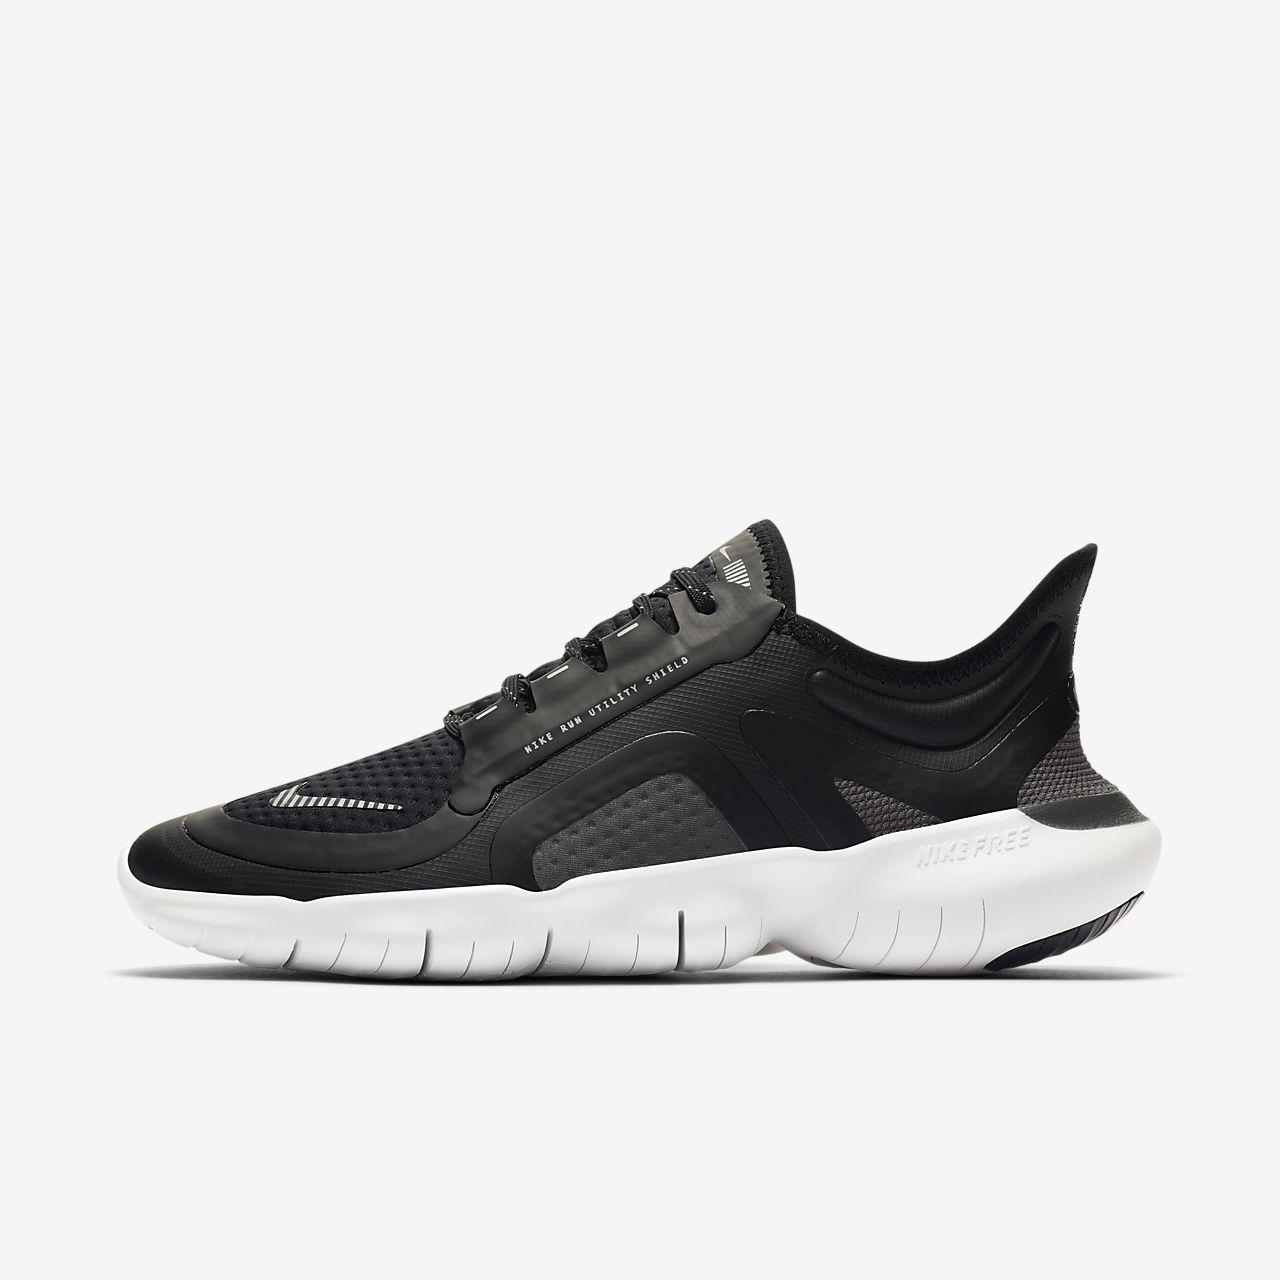 Sapatilhas de running Nike Free RN 5.0 Shield para mulher